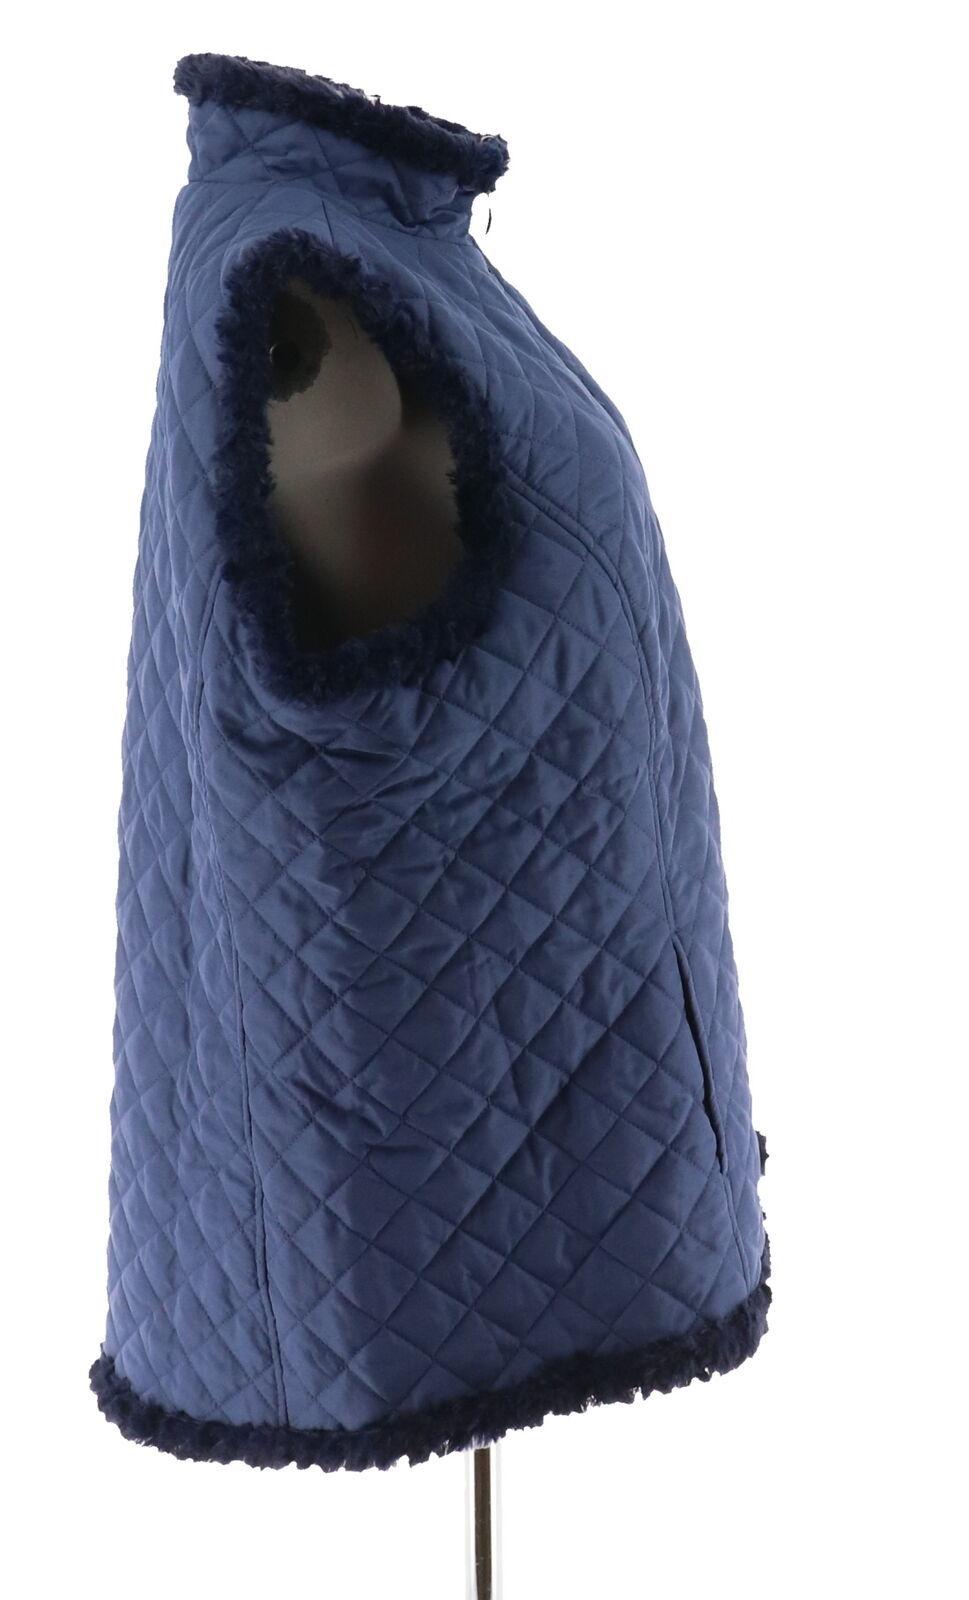 Denim & Co Reversible Zip Front Textured Quilted Vest Dark Indigo M NEW A282681 image 4